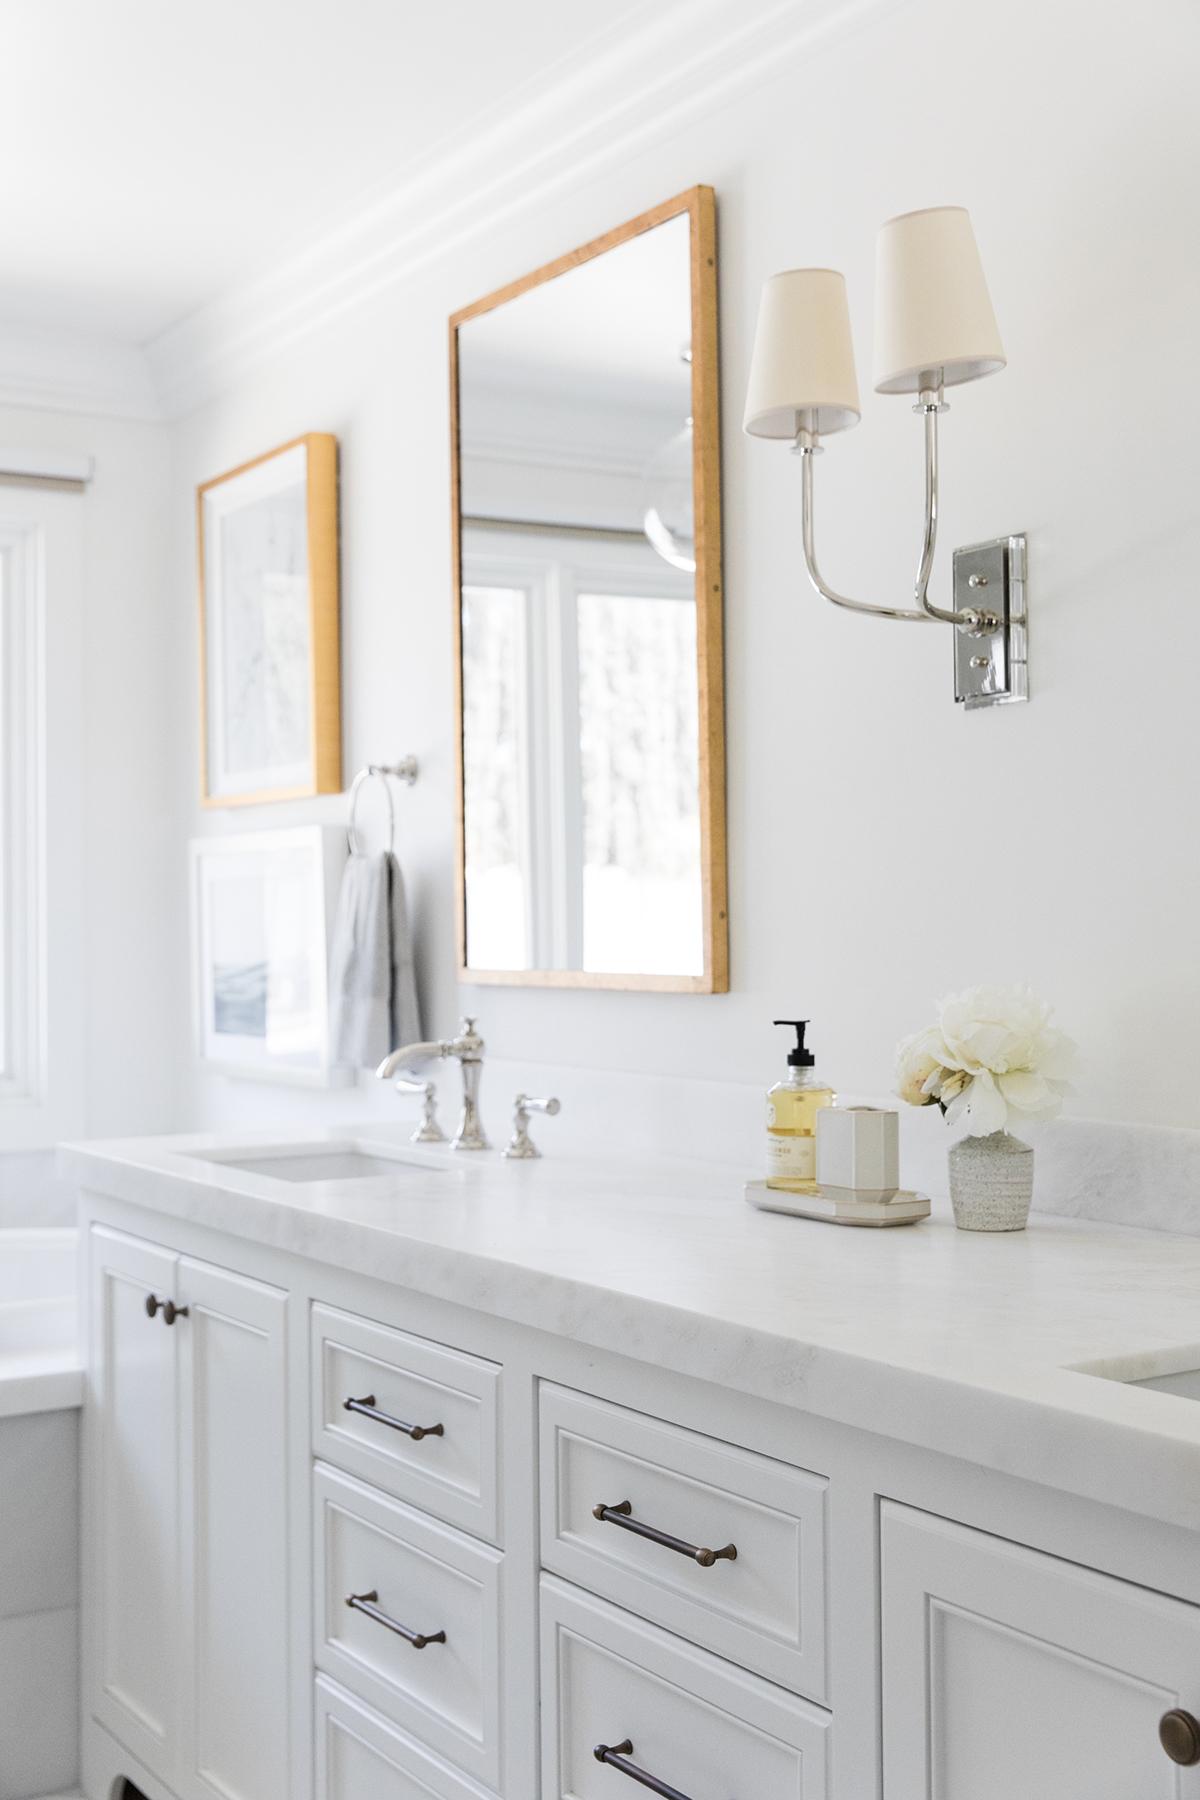 Clean+and+coastal+bathroom+with+pendant+over+bathtub,+brass+and+polished+nickel+decor+in+bathroom+_+Studio+McGee+Design.jpg